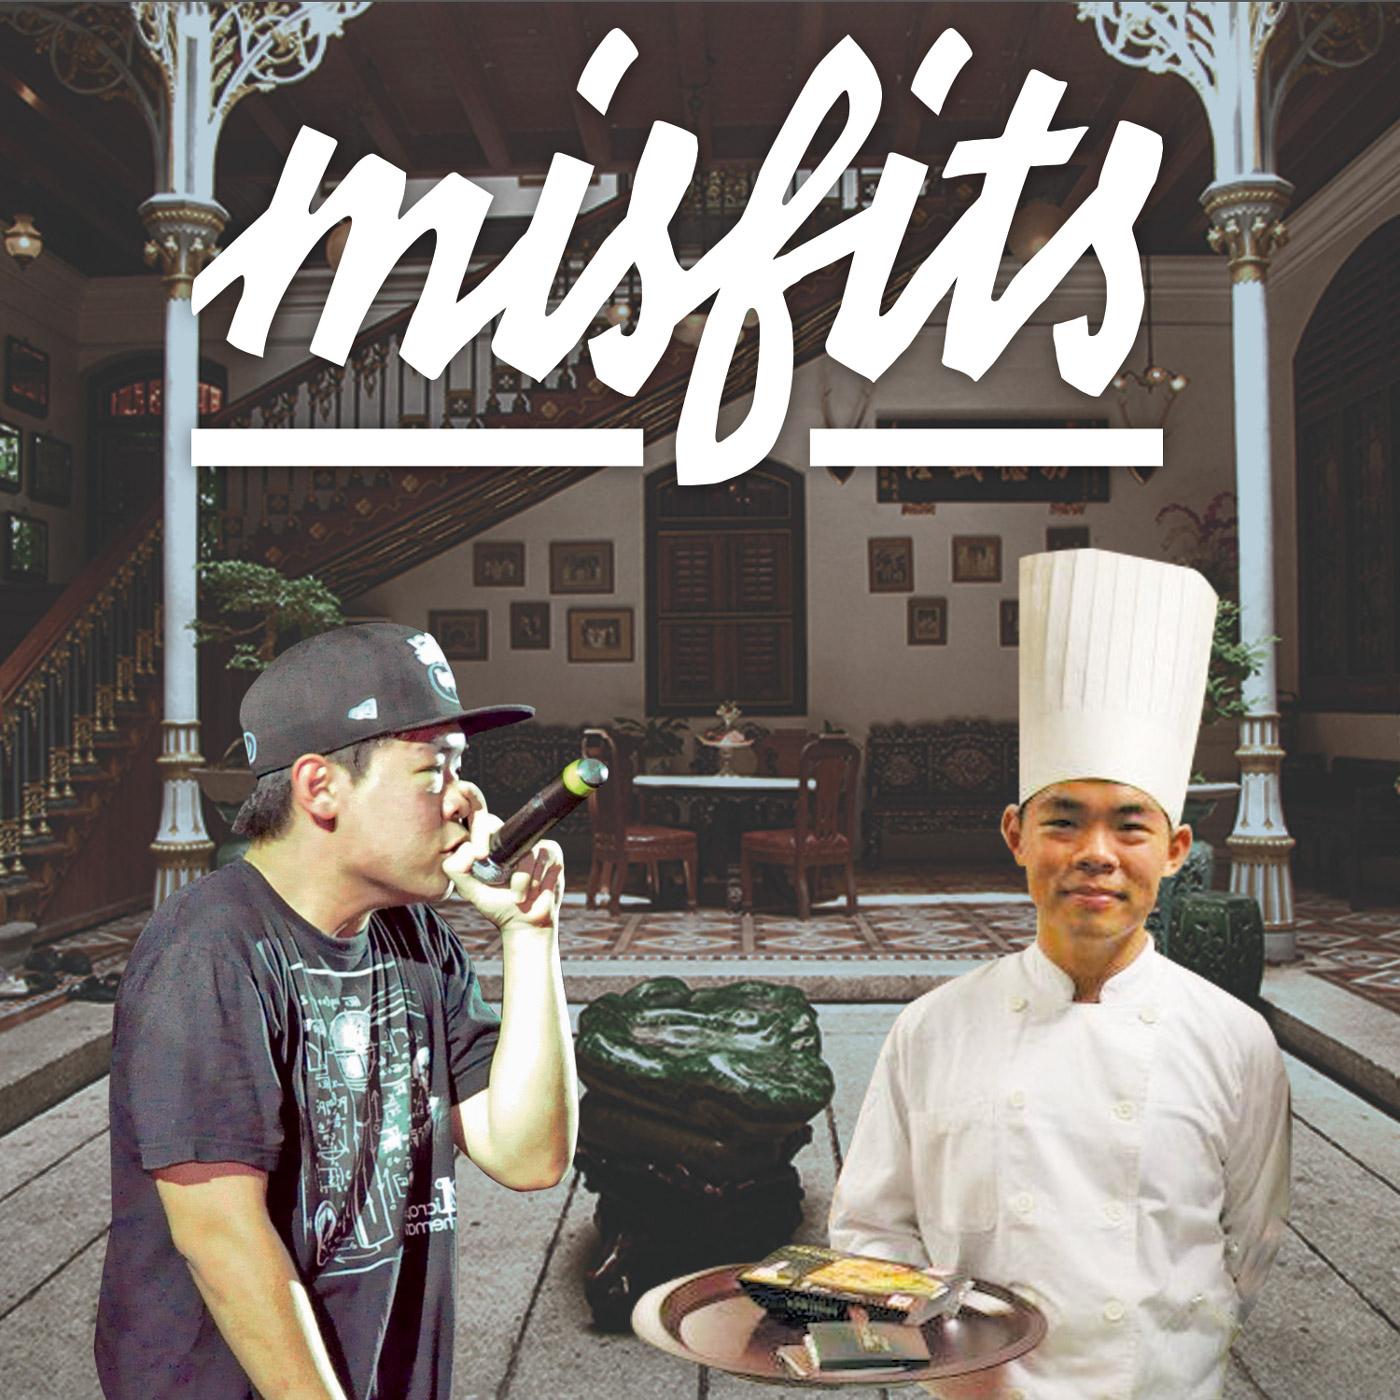 Misfits: Wisdoms with unconventional Singaporean logo